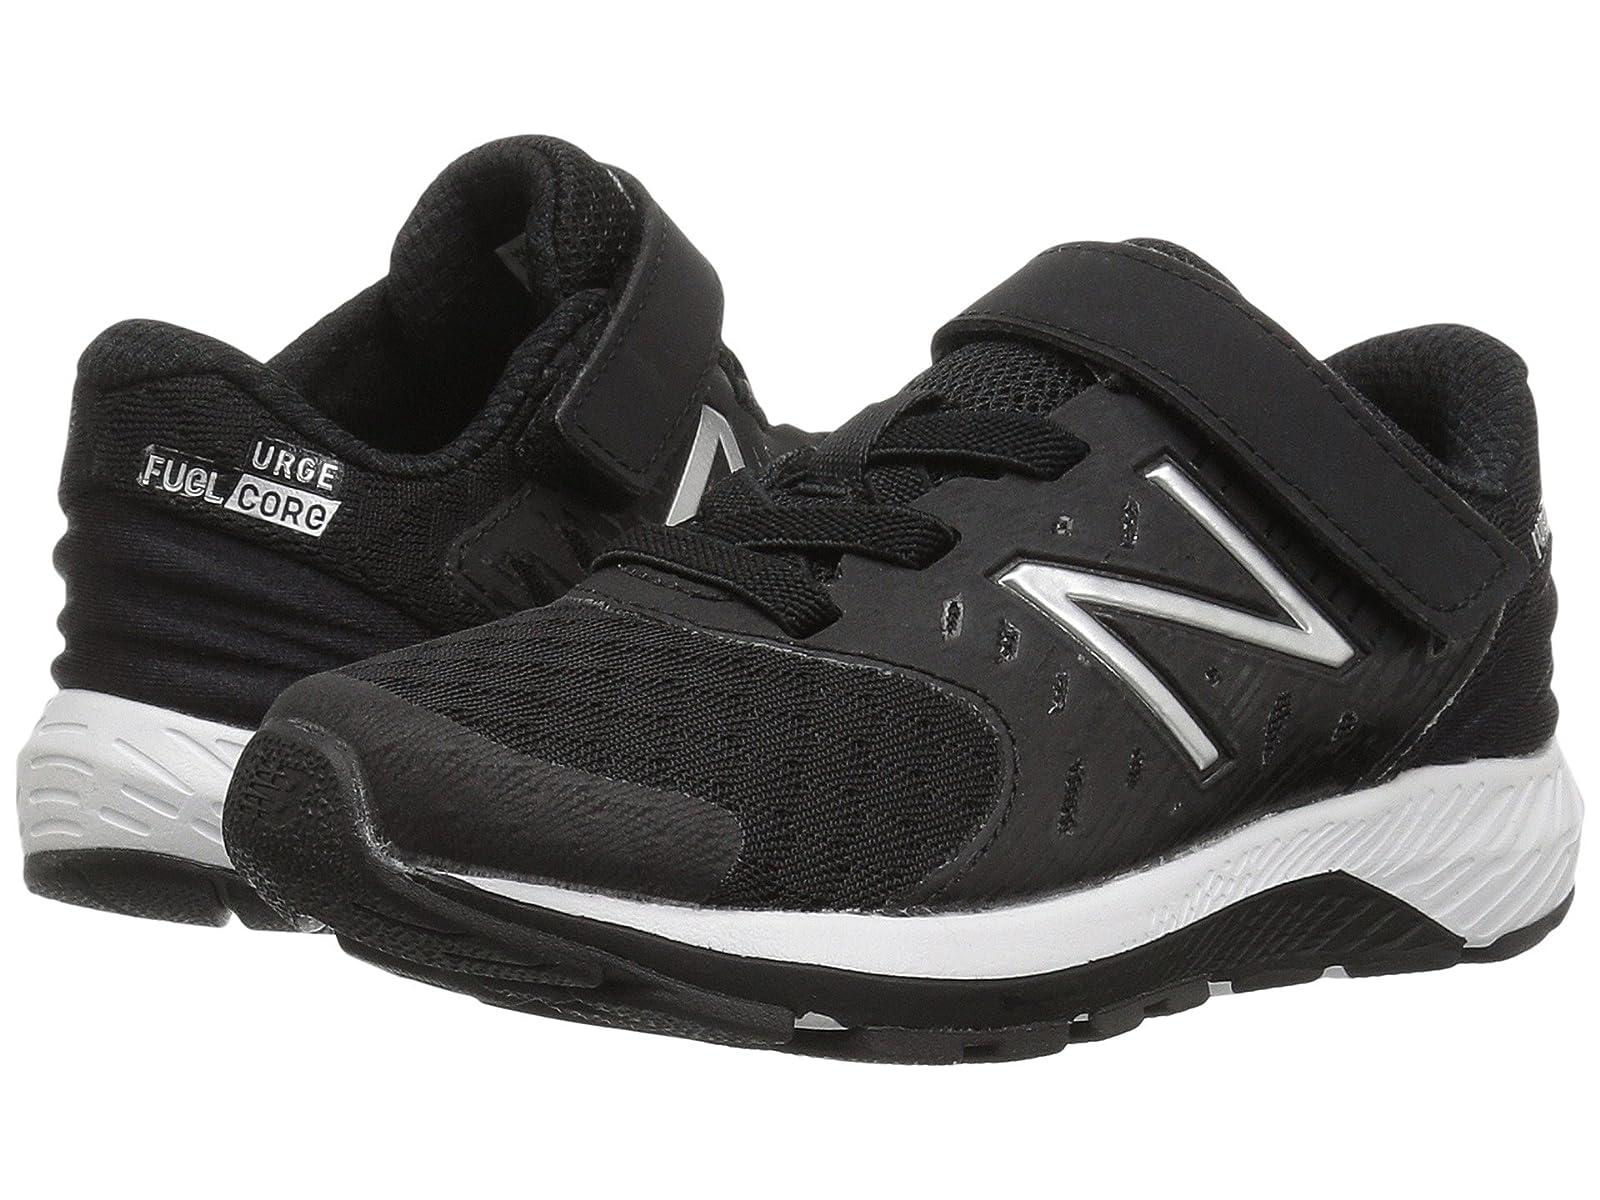 New Balance Kids Vazee Urge (Little Kid)Atmospheric grades have affordable shoes